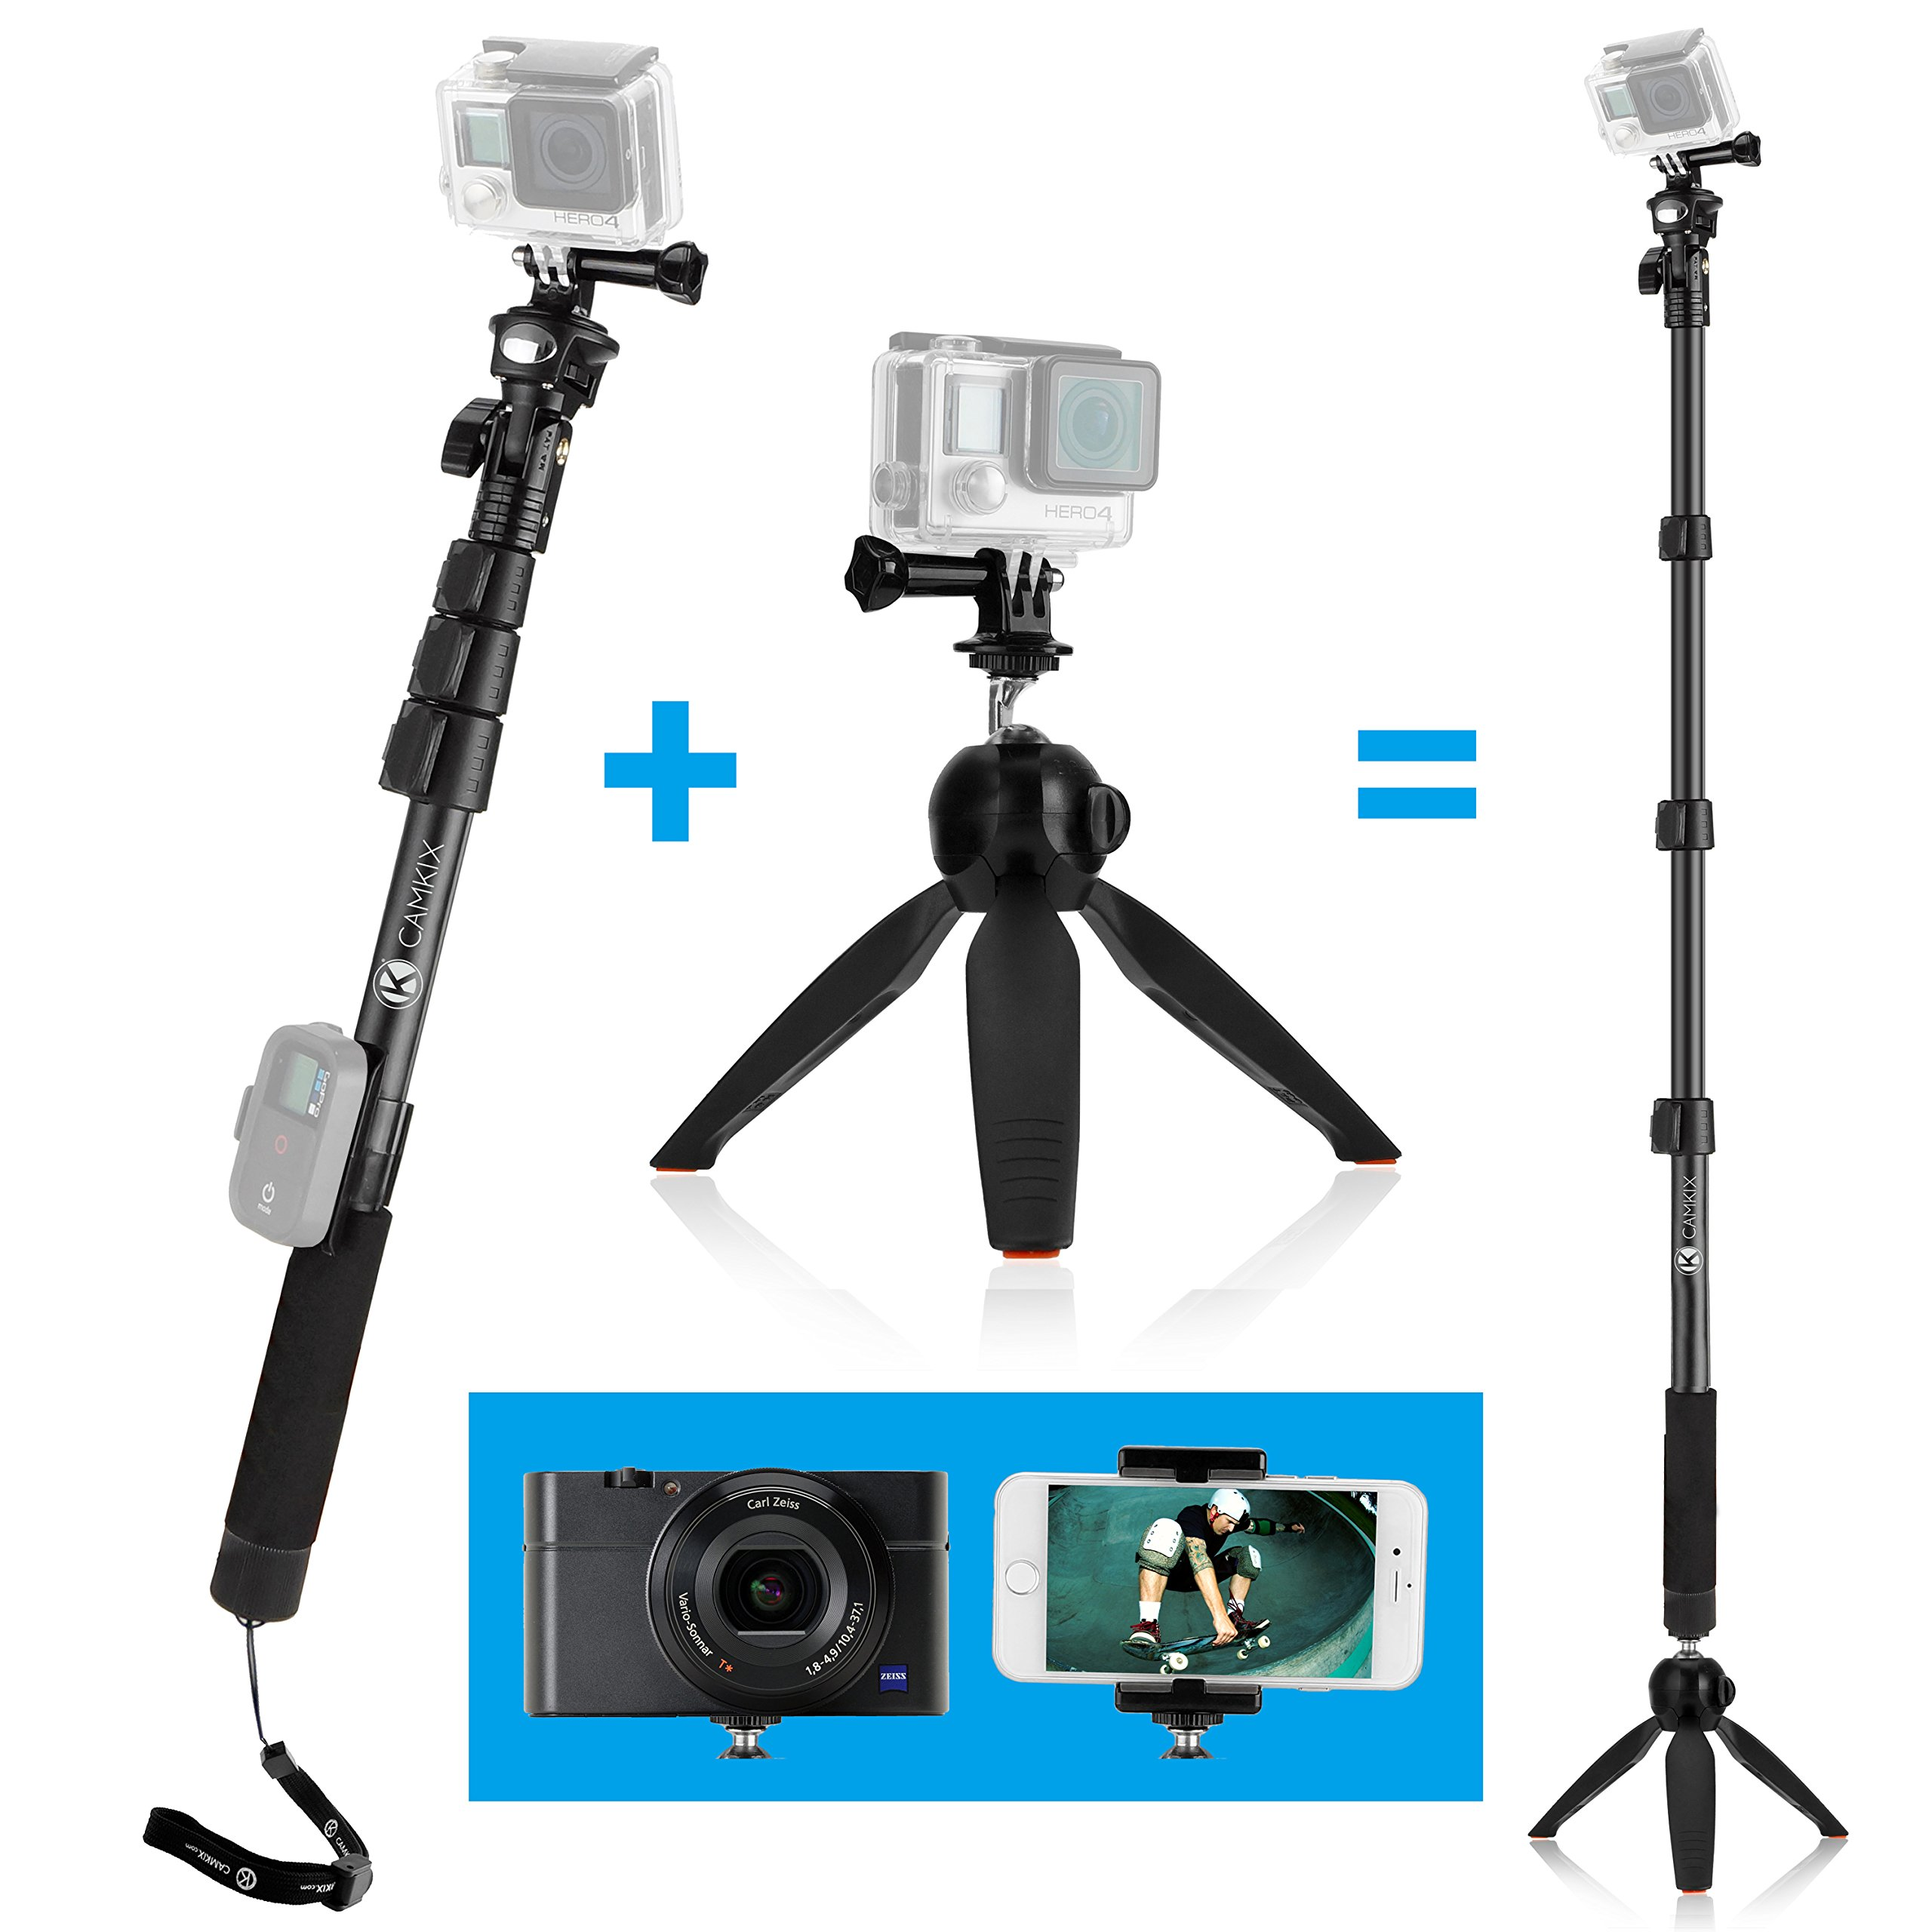 CamKix Premium 3in1 Telescopic Pole 16-47 Inch & Tripod Base Kit Compatible with GoPro Hero 7, 6, Fusion, 5, Black, Session, Hero 4, Session, Black, Silver, DJI Osmo Action, Camera + Smartphone by CamKix